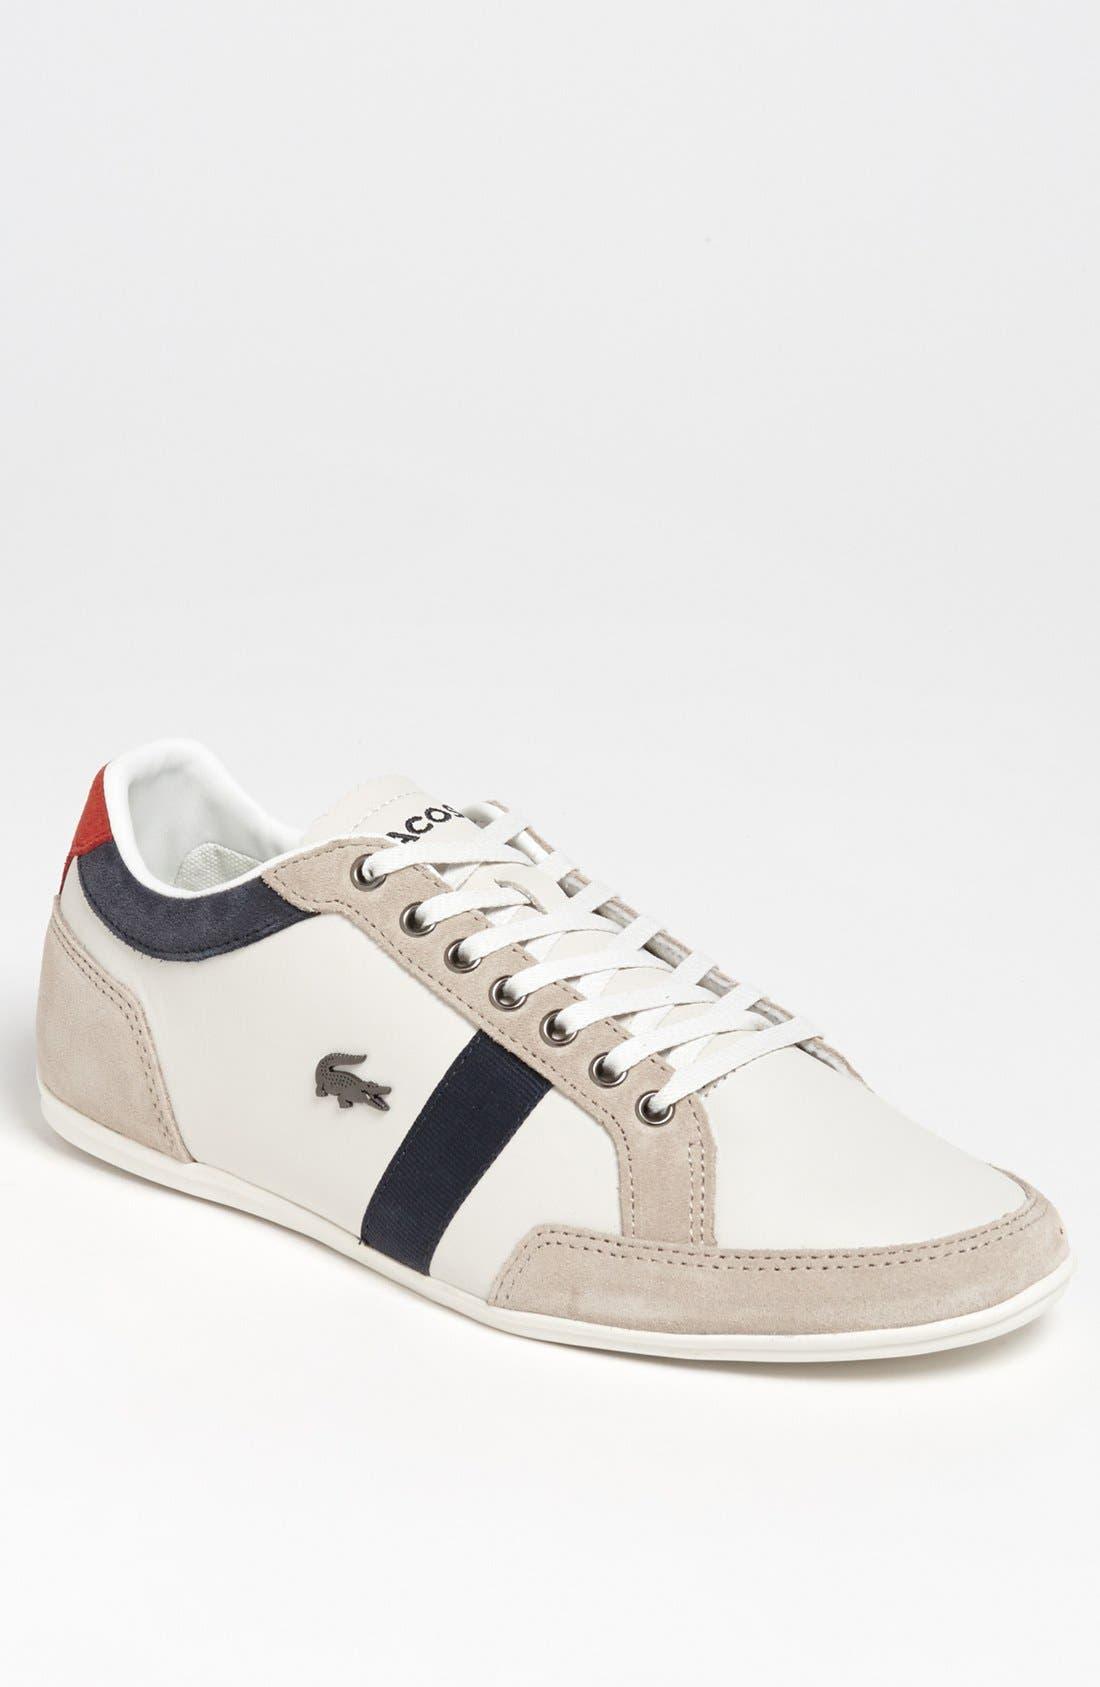 Alternate Image 1 Selected - Lacoste 'Alisos 8' Sneaker